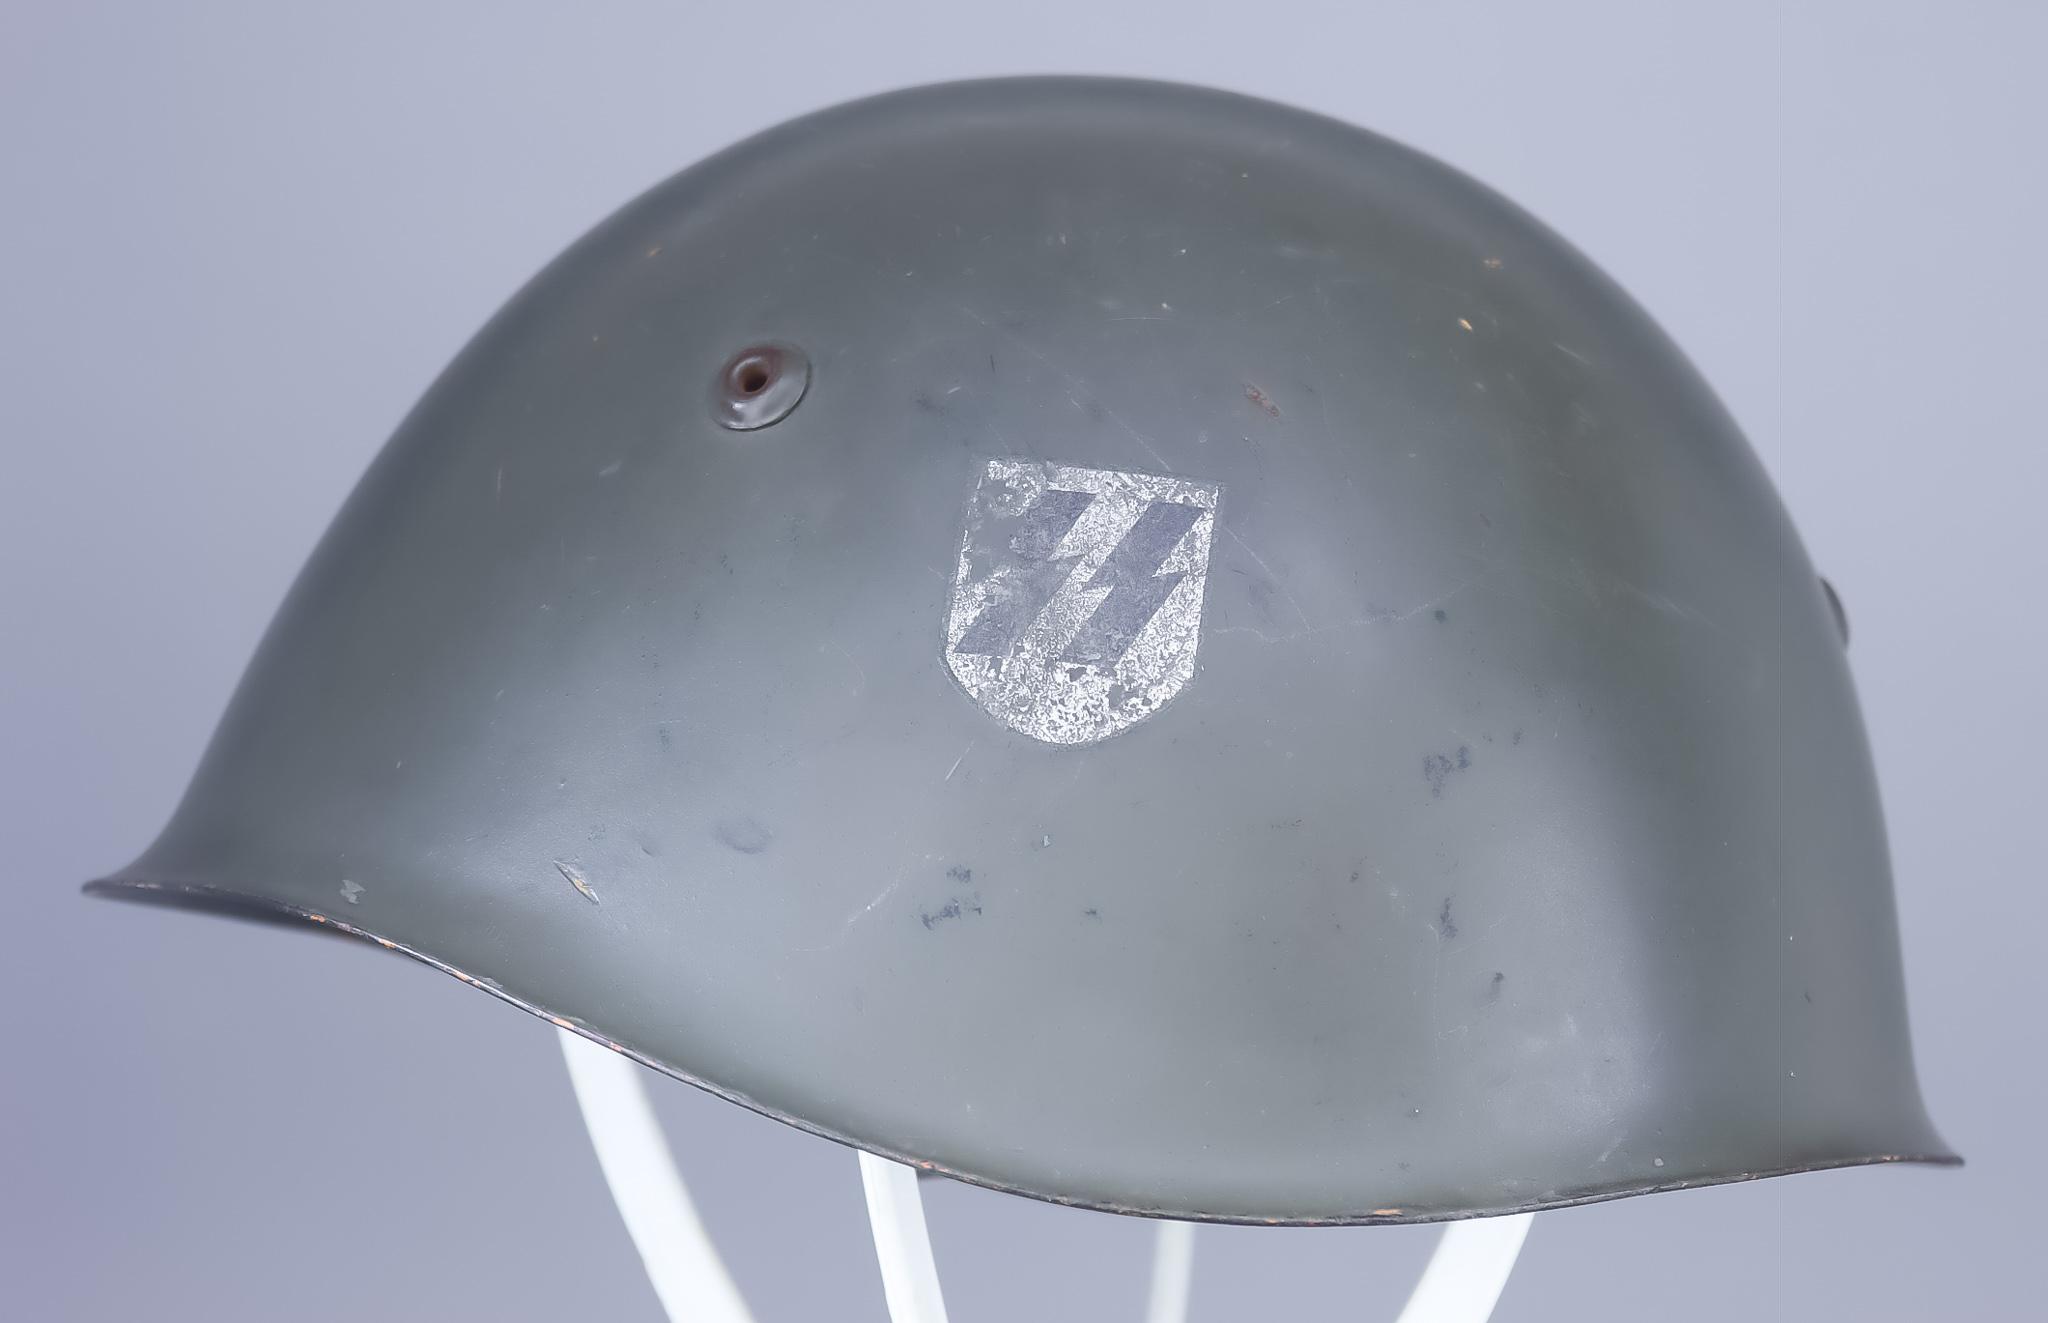 An Italian or Croatian Helmet, painted, with single SS decal